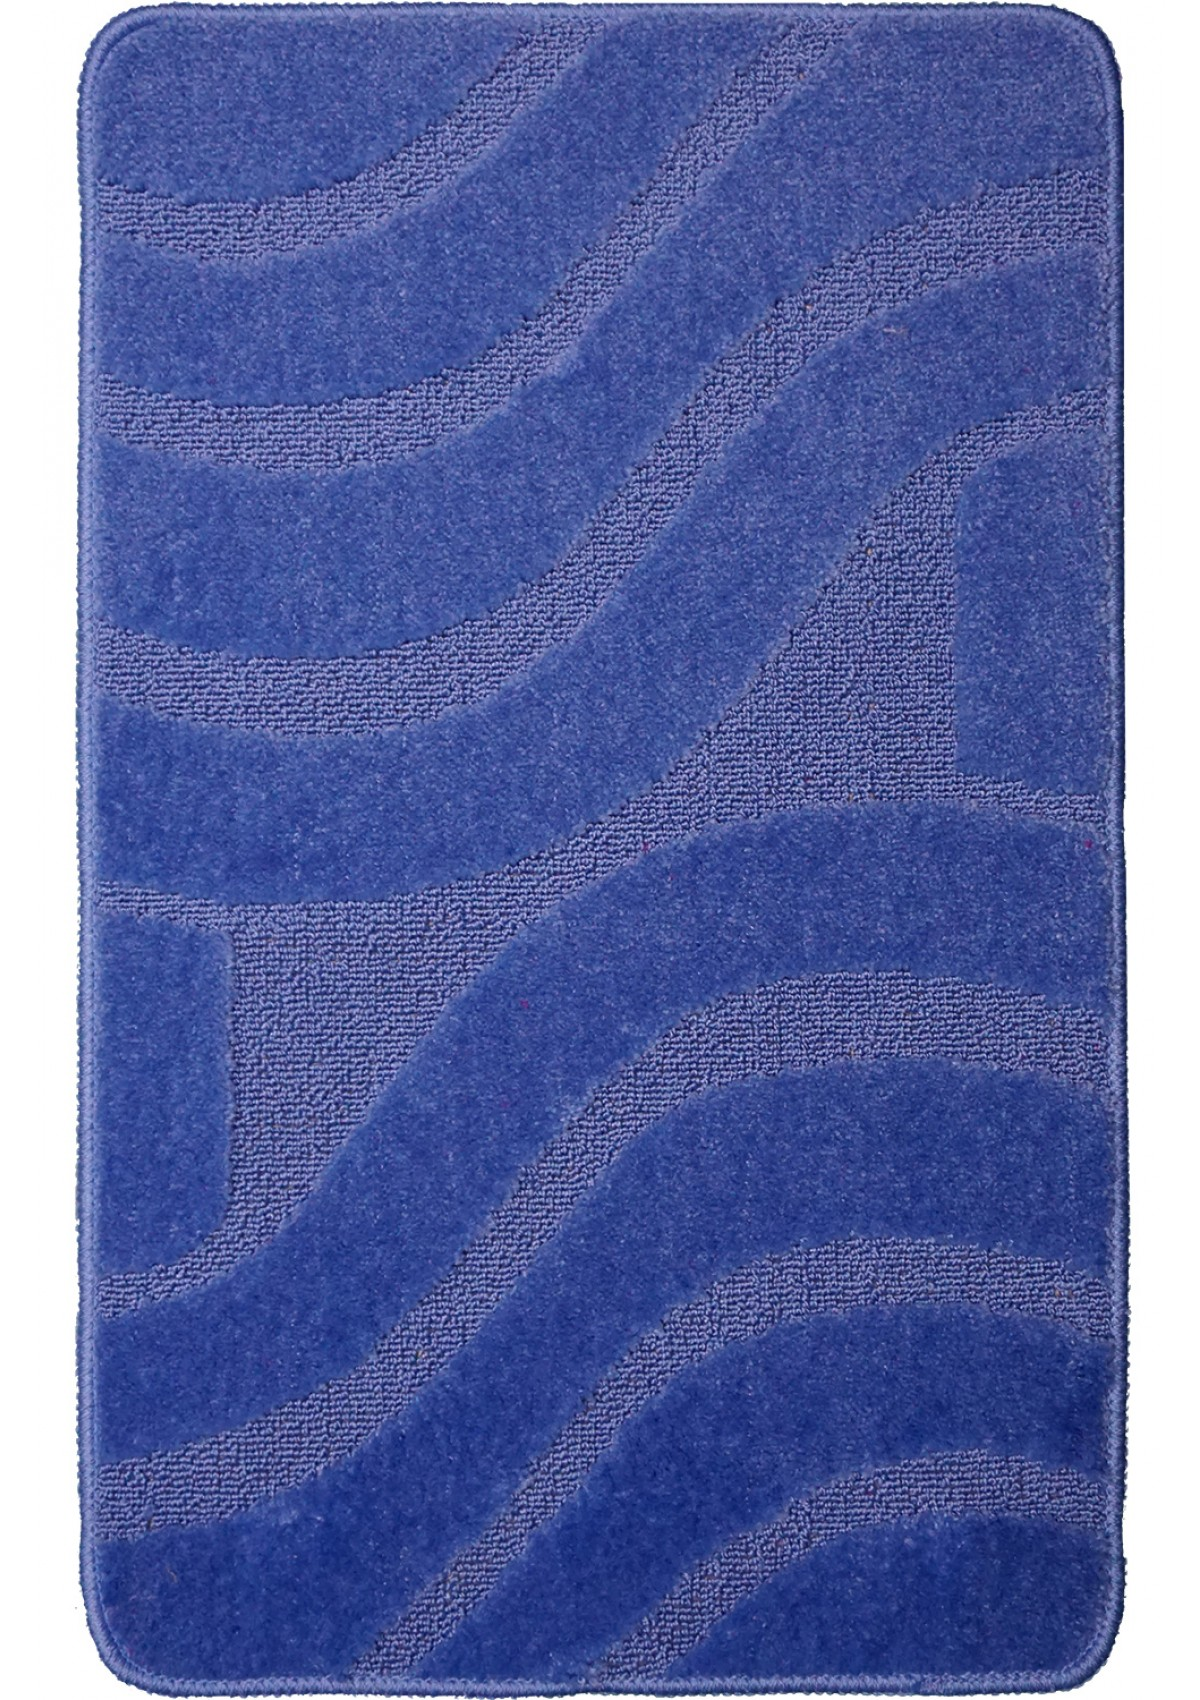 Килимок EKSIMOR SYMPHONY 2509 pc1 Blue